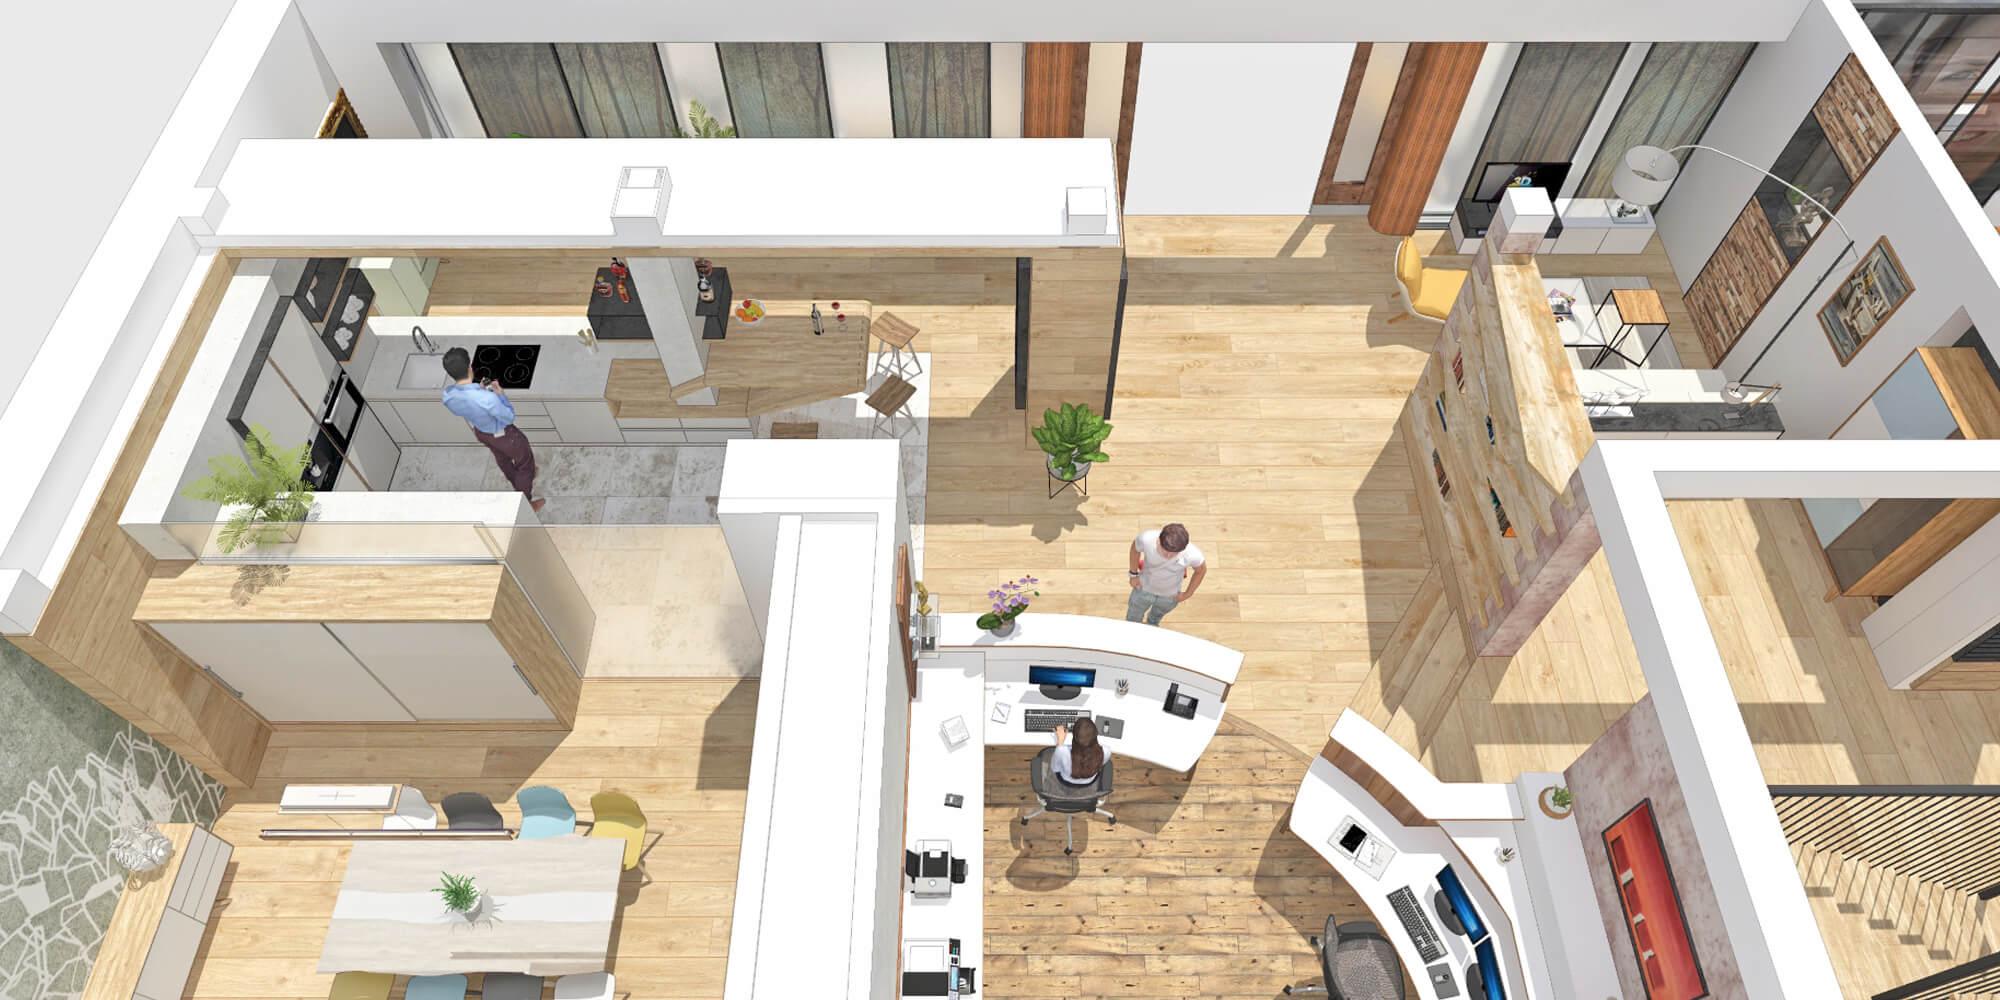 Cre-Plan-Design-Architektur-Innenarchitektur-Design-Referenz-Andexlinger-02